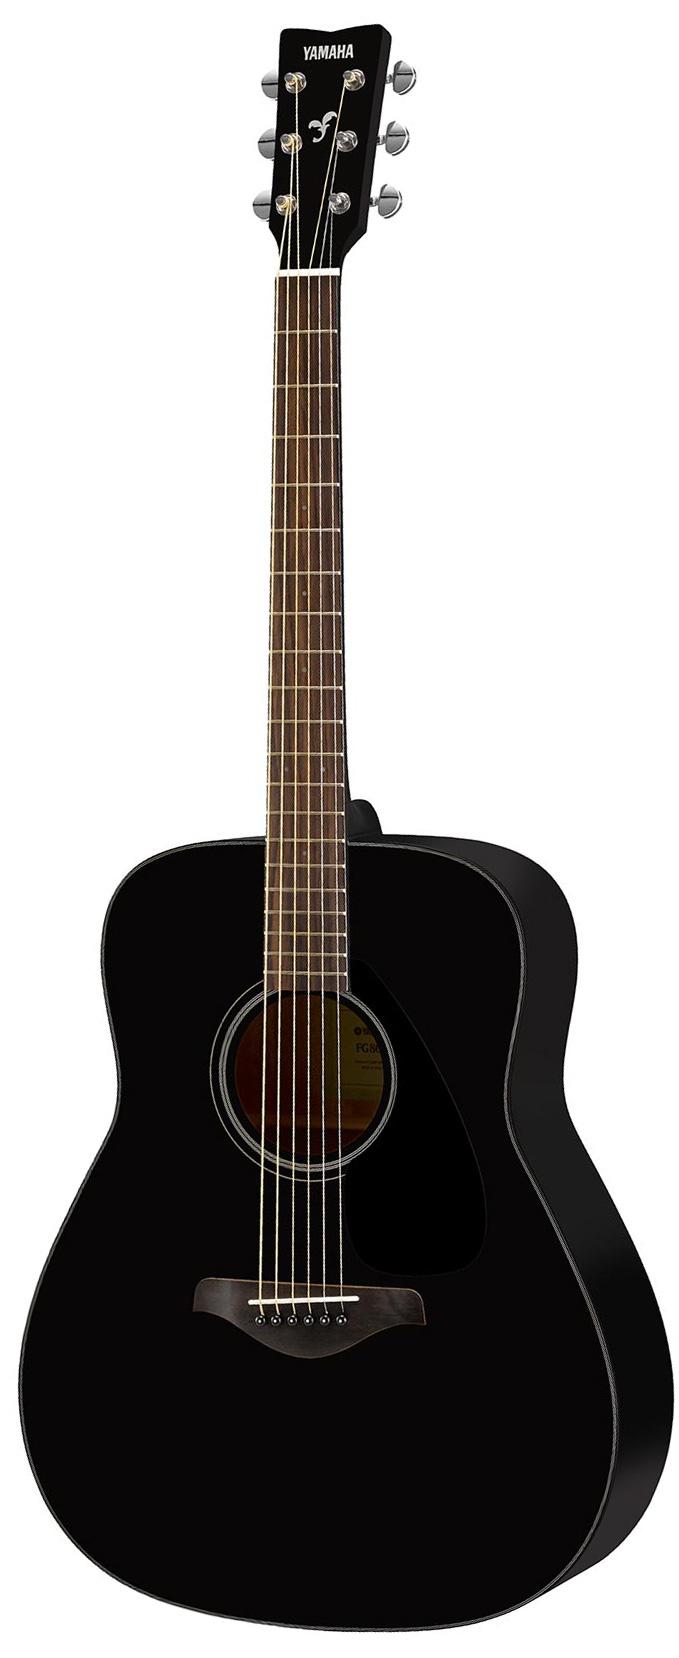 Yamaha fg800s black for Yamaha guitar brands